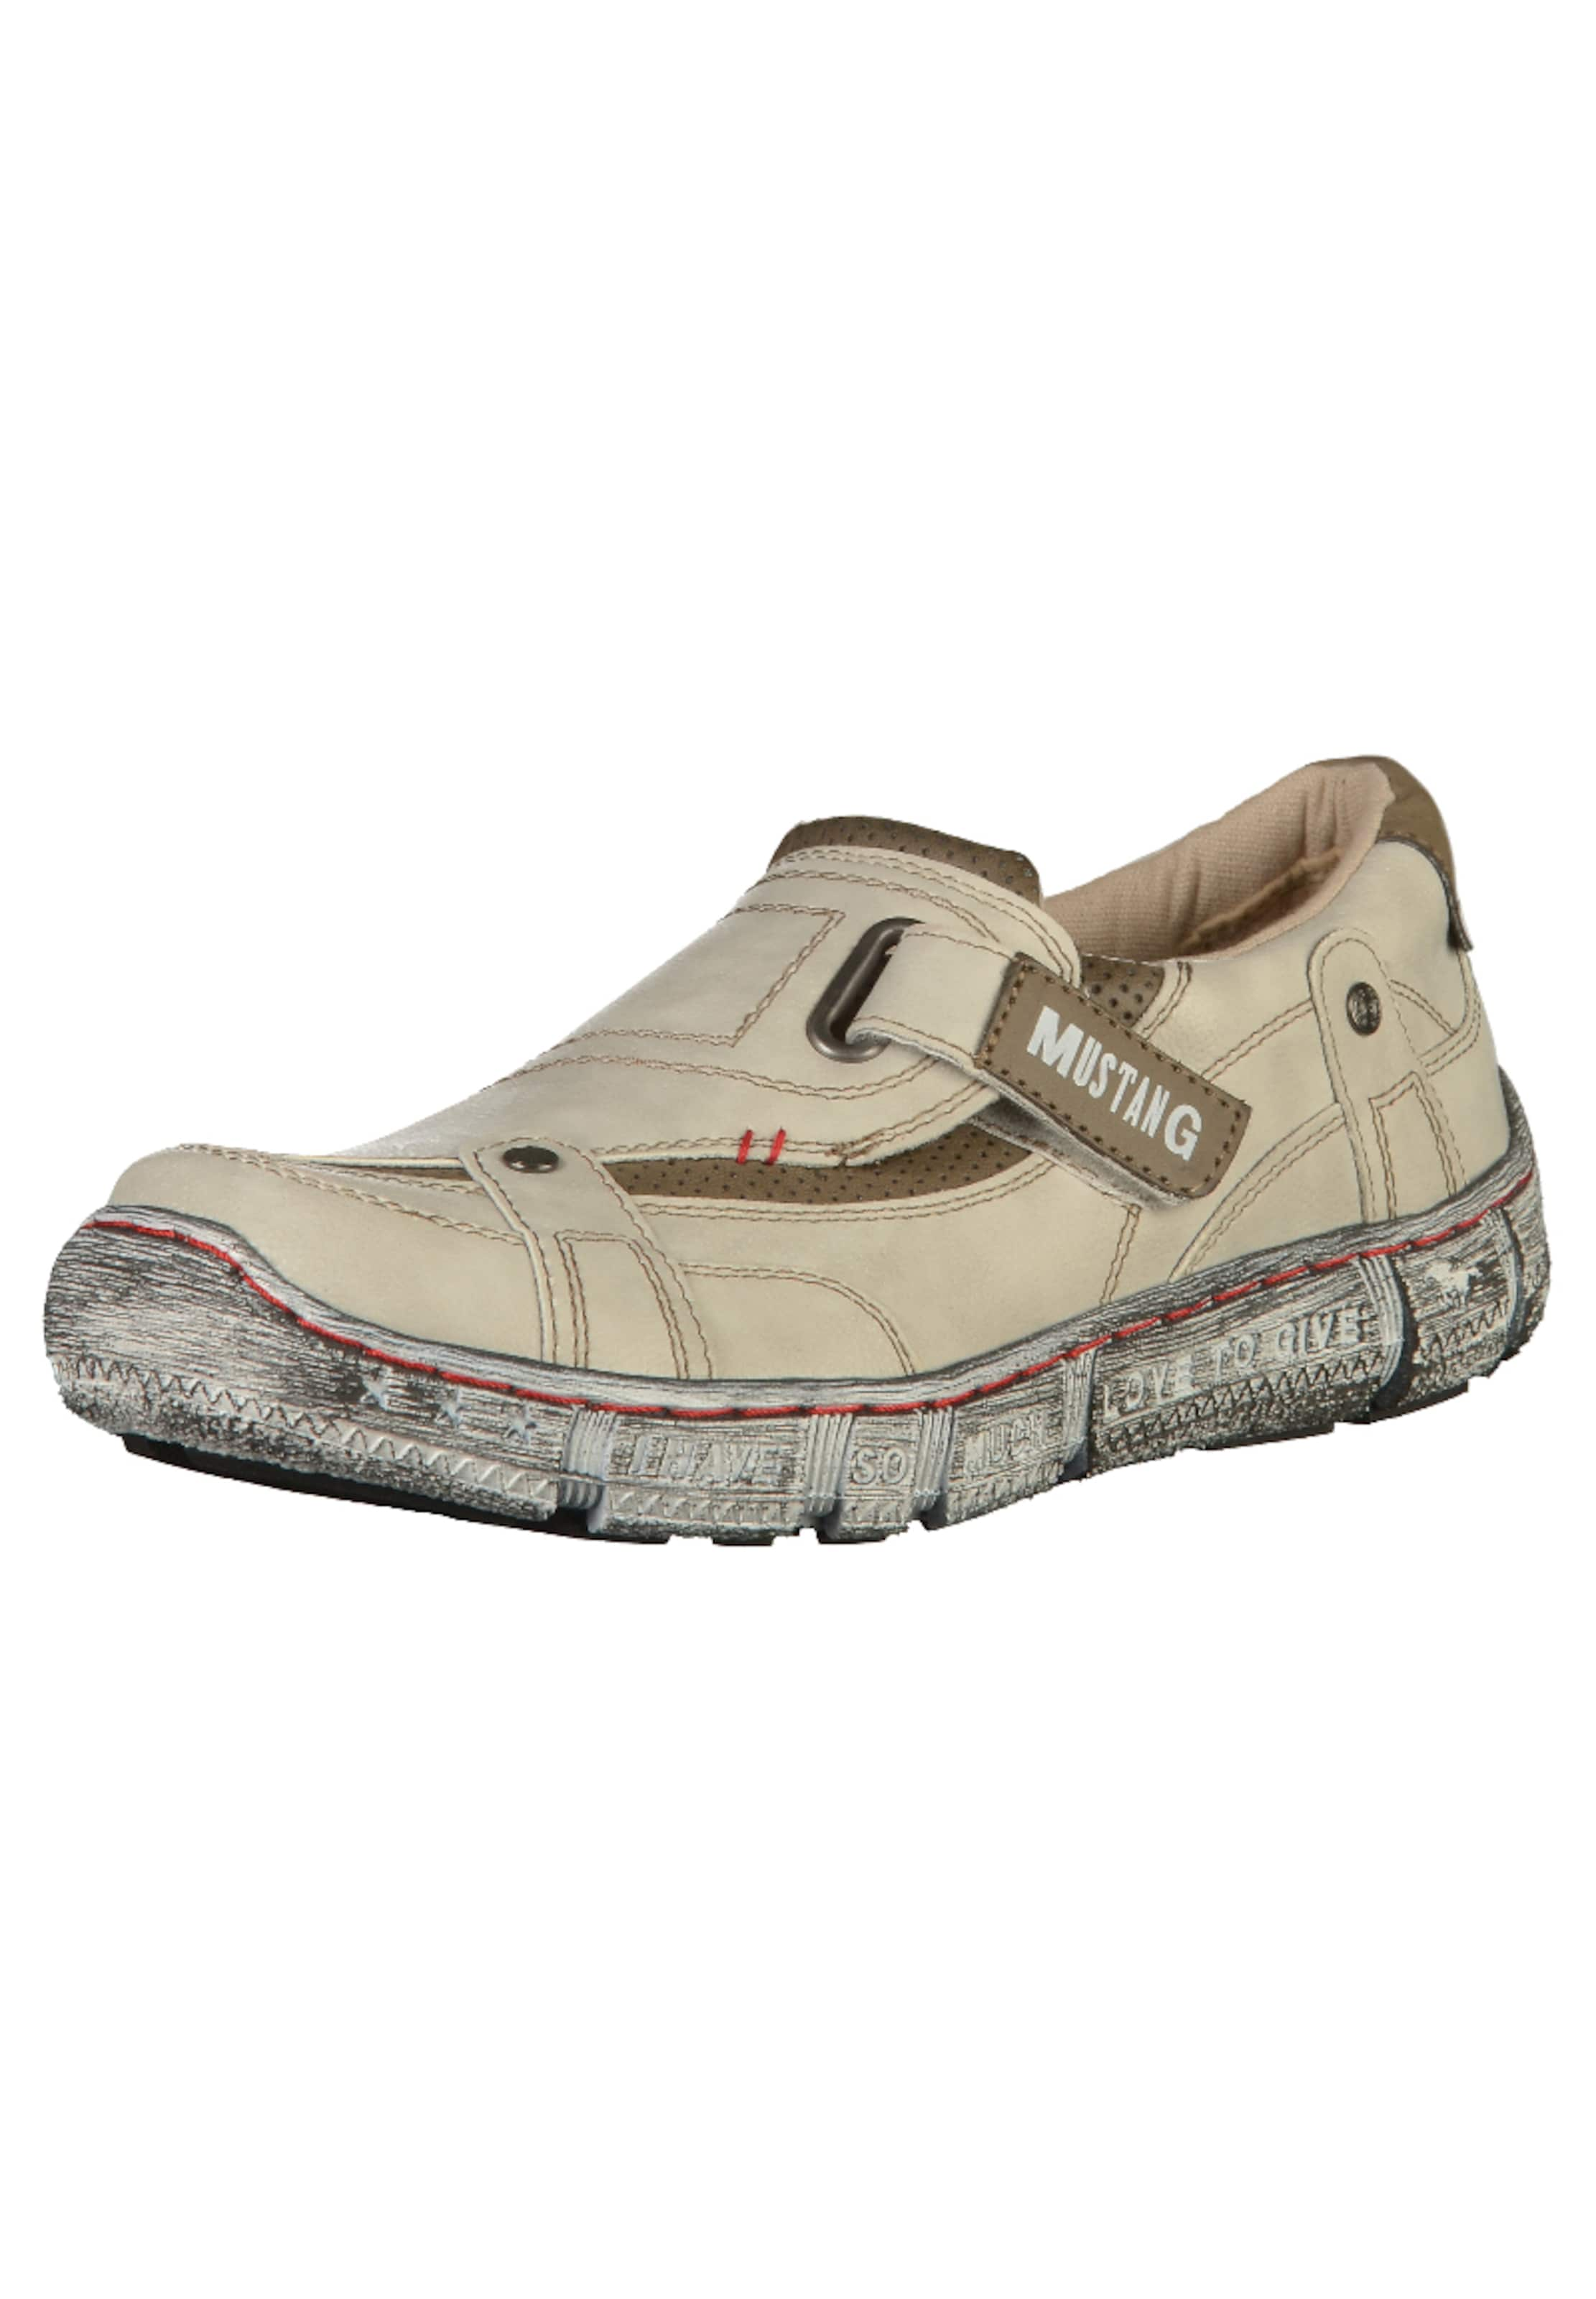 MUSTANG Halbschuhe Verschleißfeste billige Schuhe Hohe Qualität